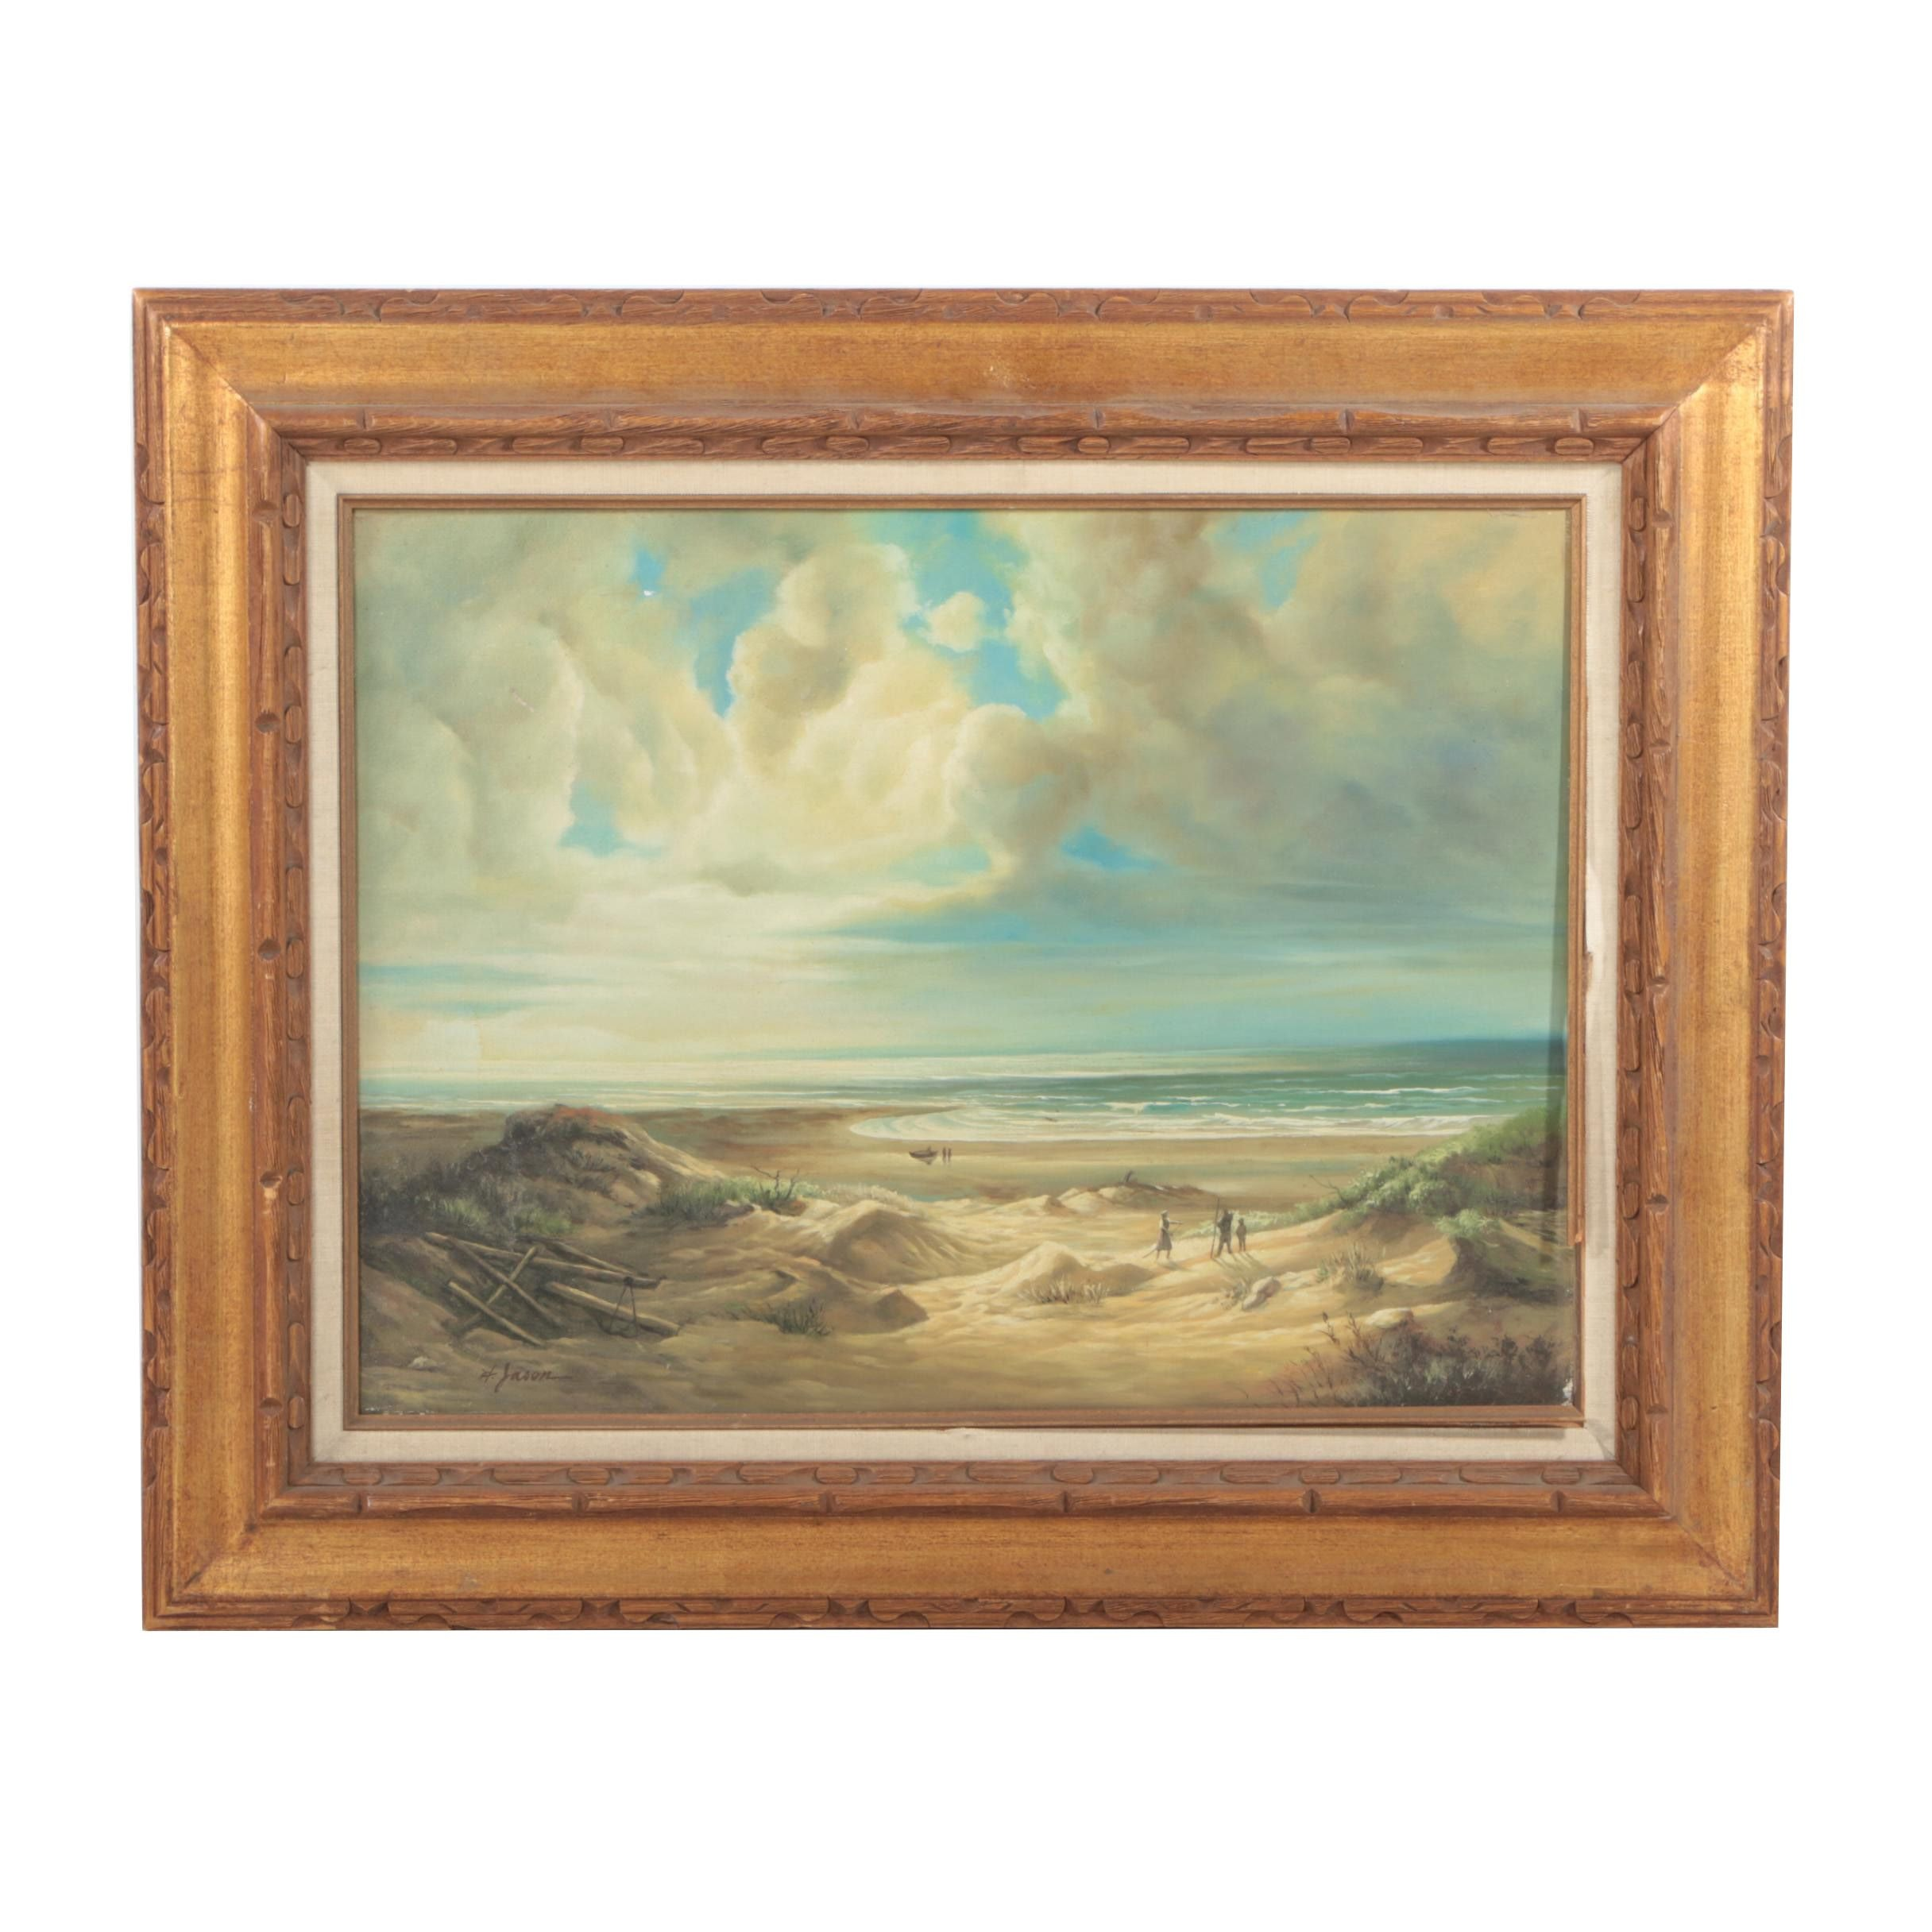 H. Jason Oil on Canvas Landscape of a Beach